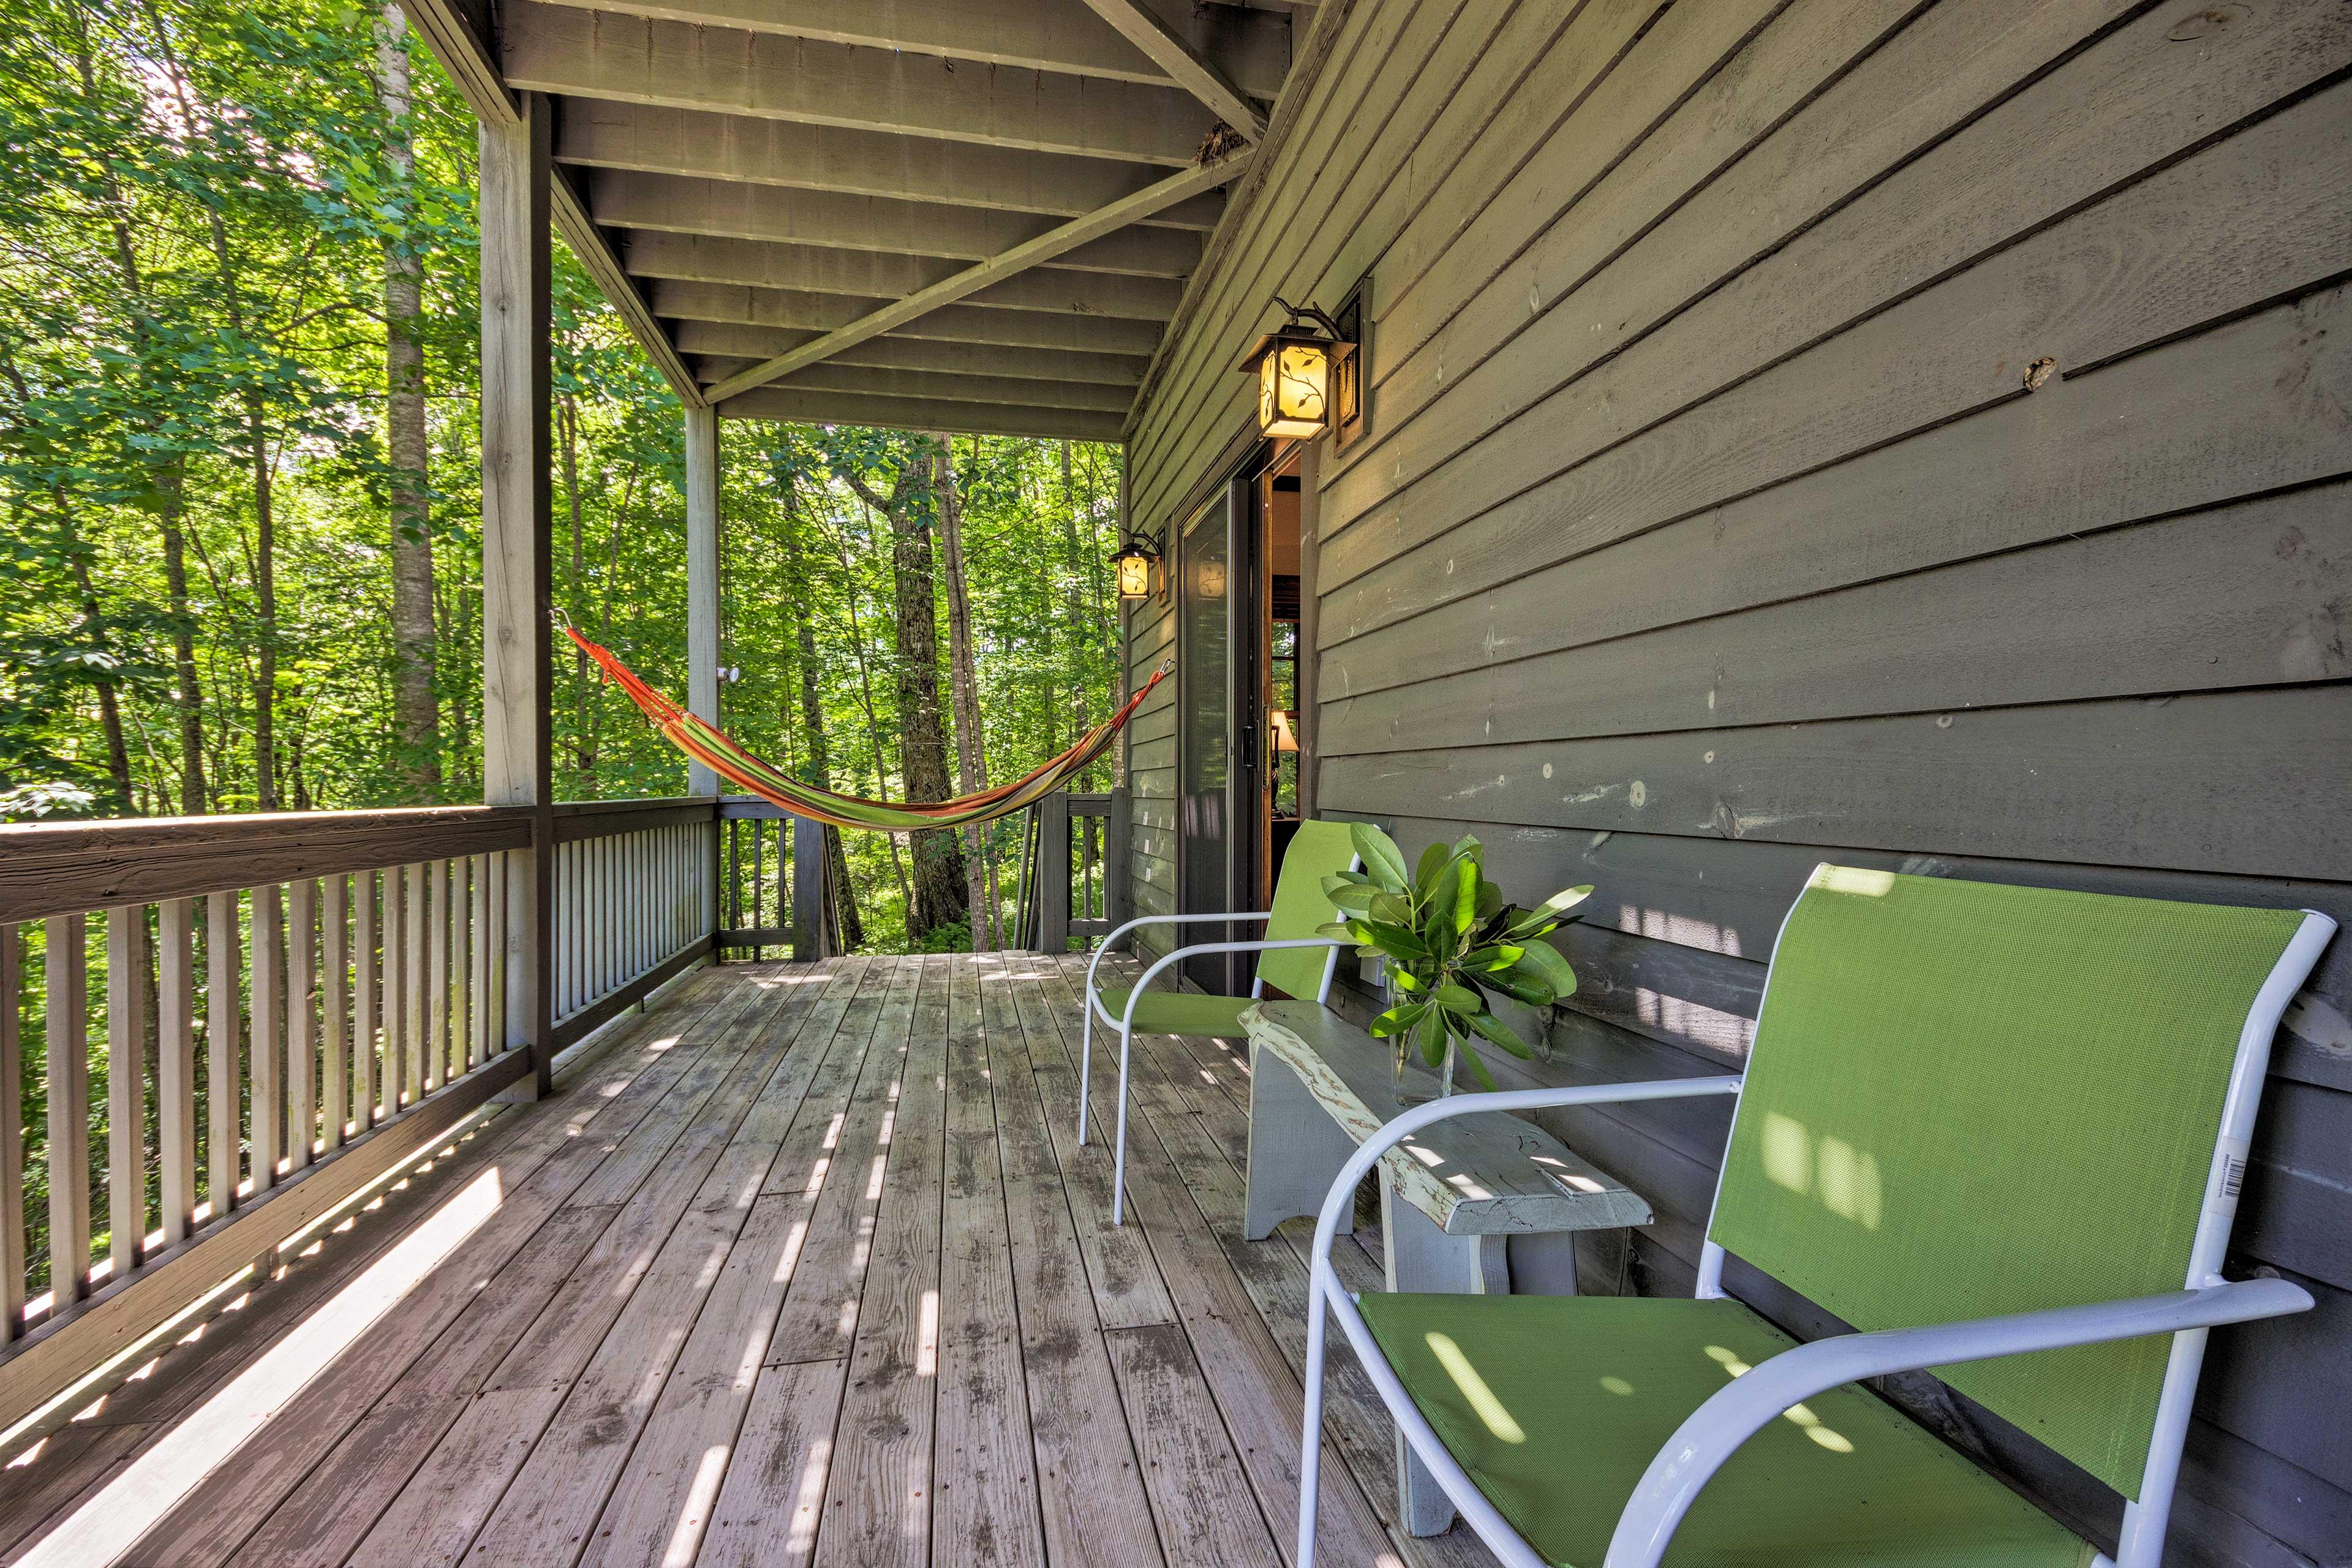 Lounge on the hammock.